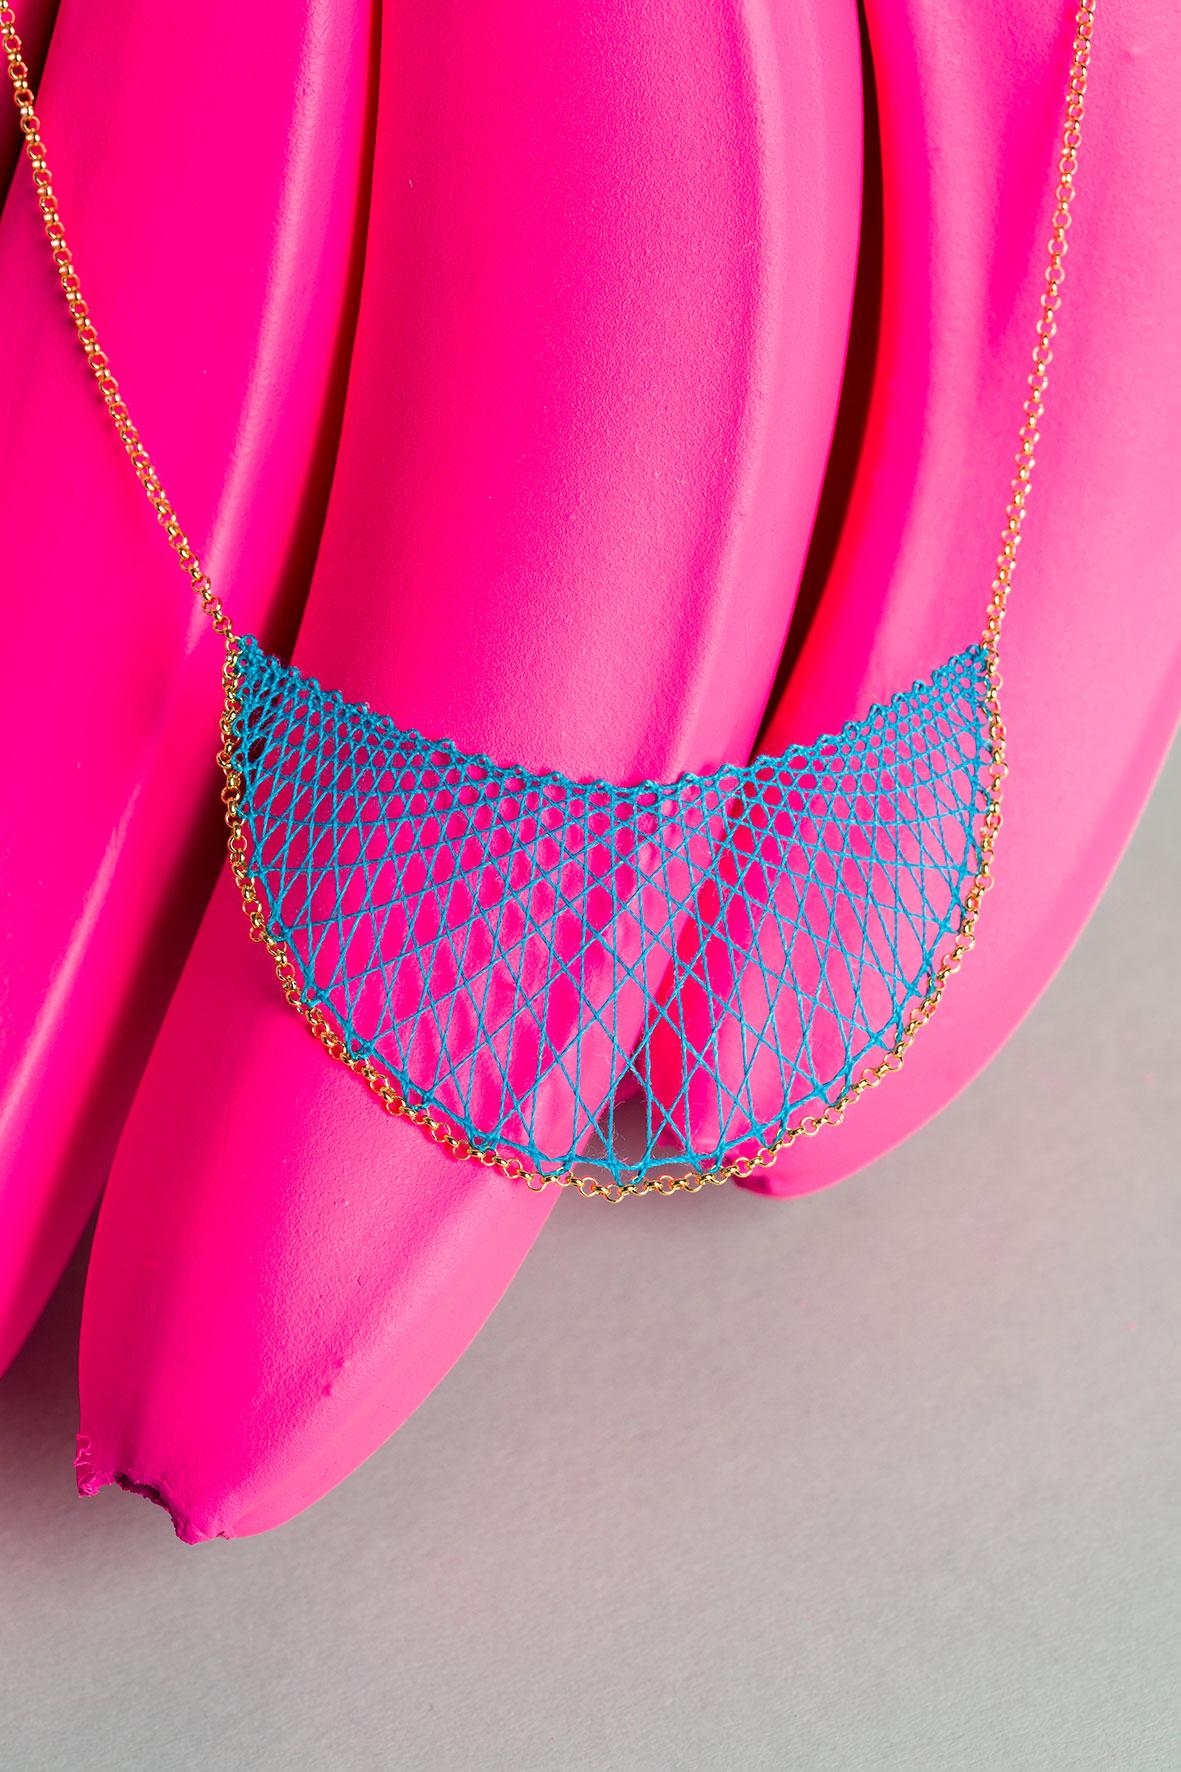 Inlace-Jewelry-2